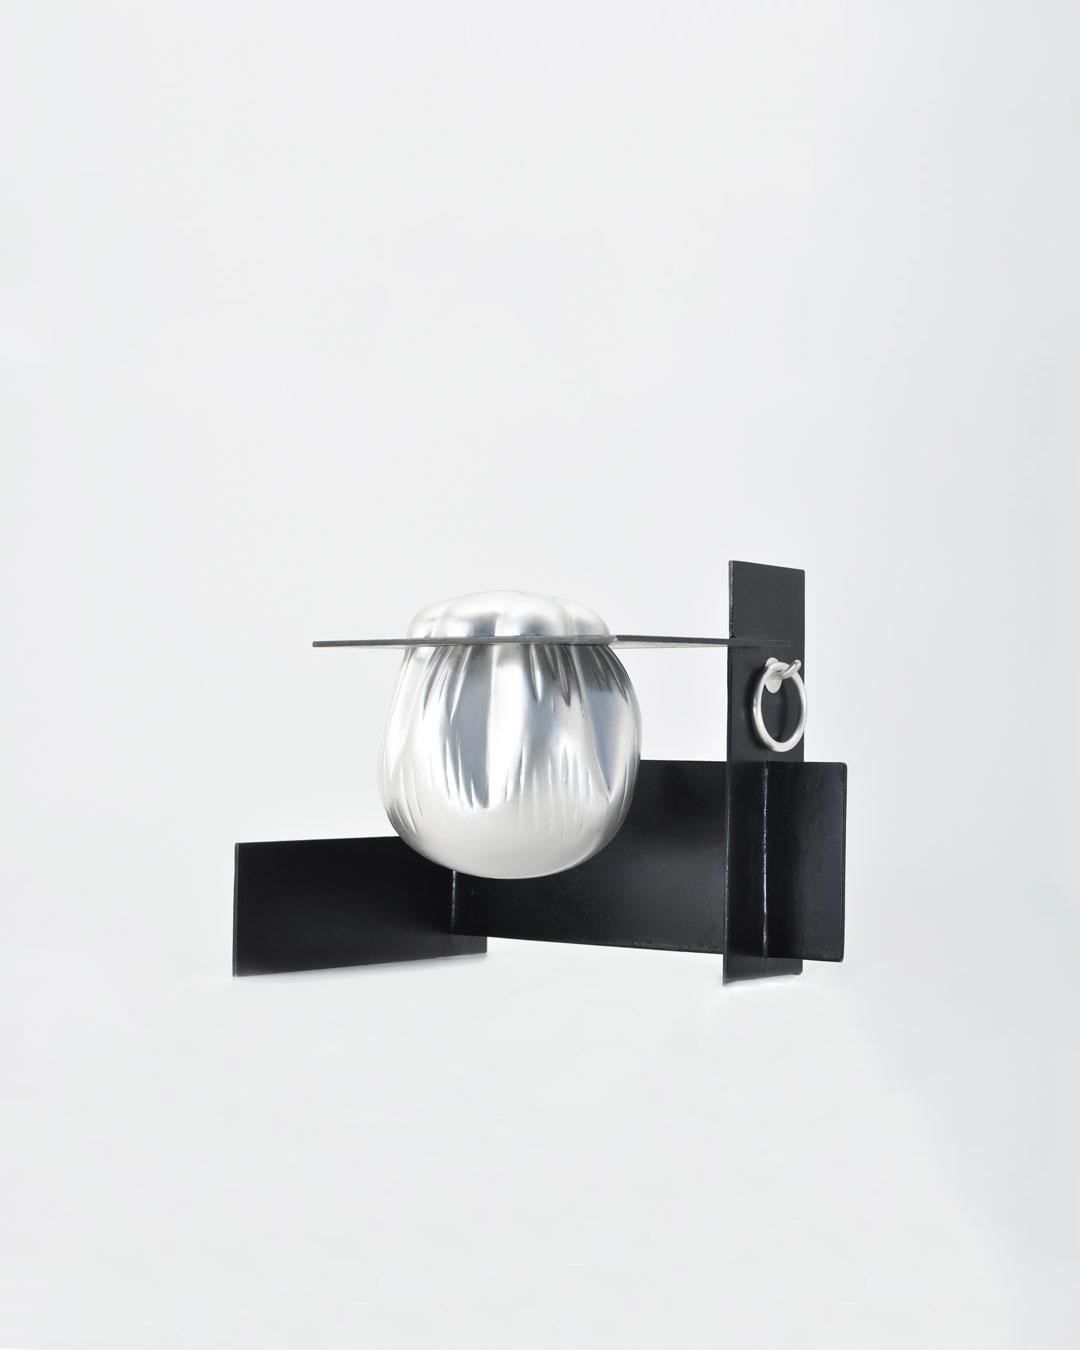 Anders Ljungberg, Bag Beneath #3, 2019, object; silver, steel, 275 x 215 x 210 mm, €7750